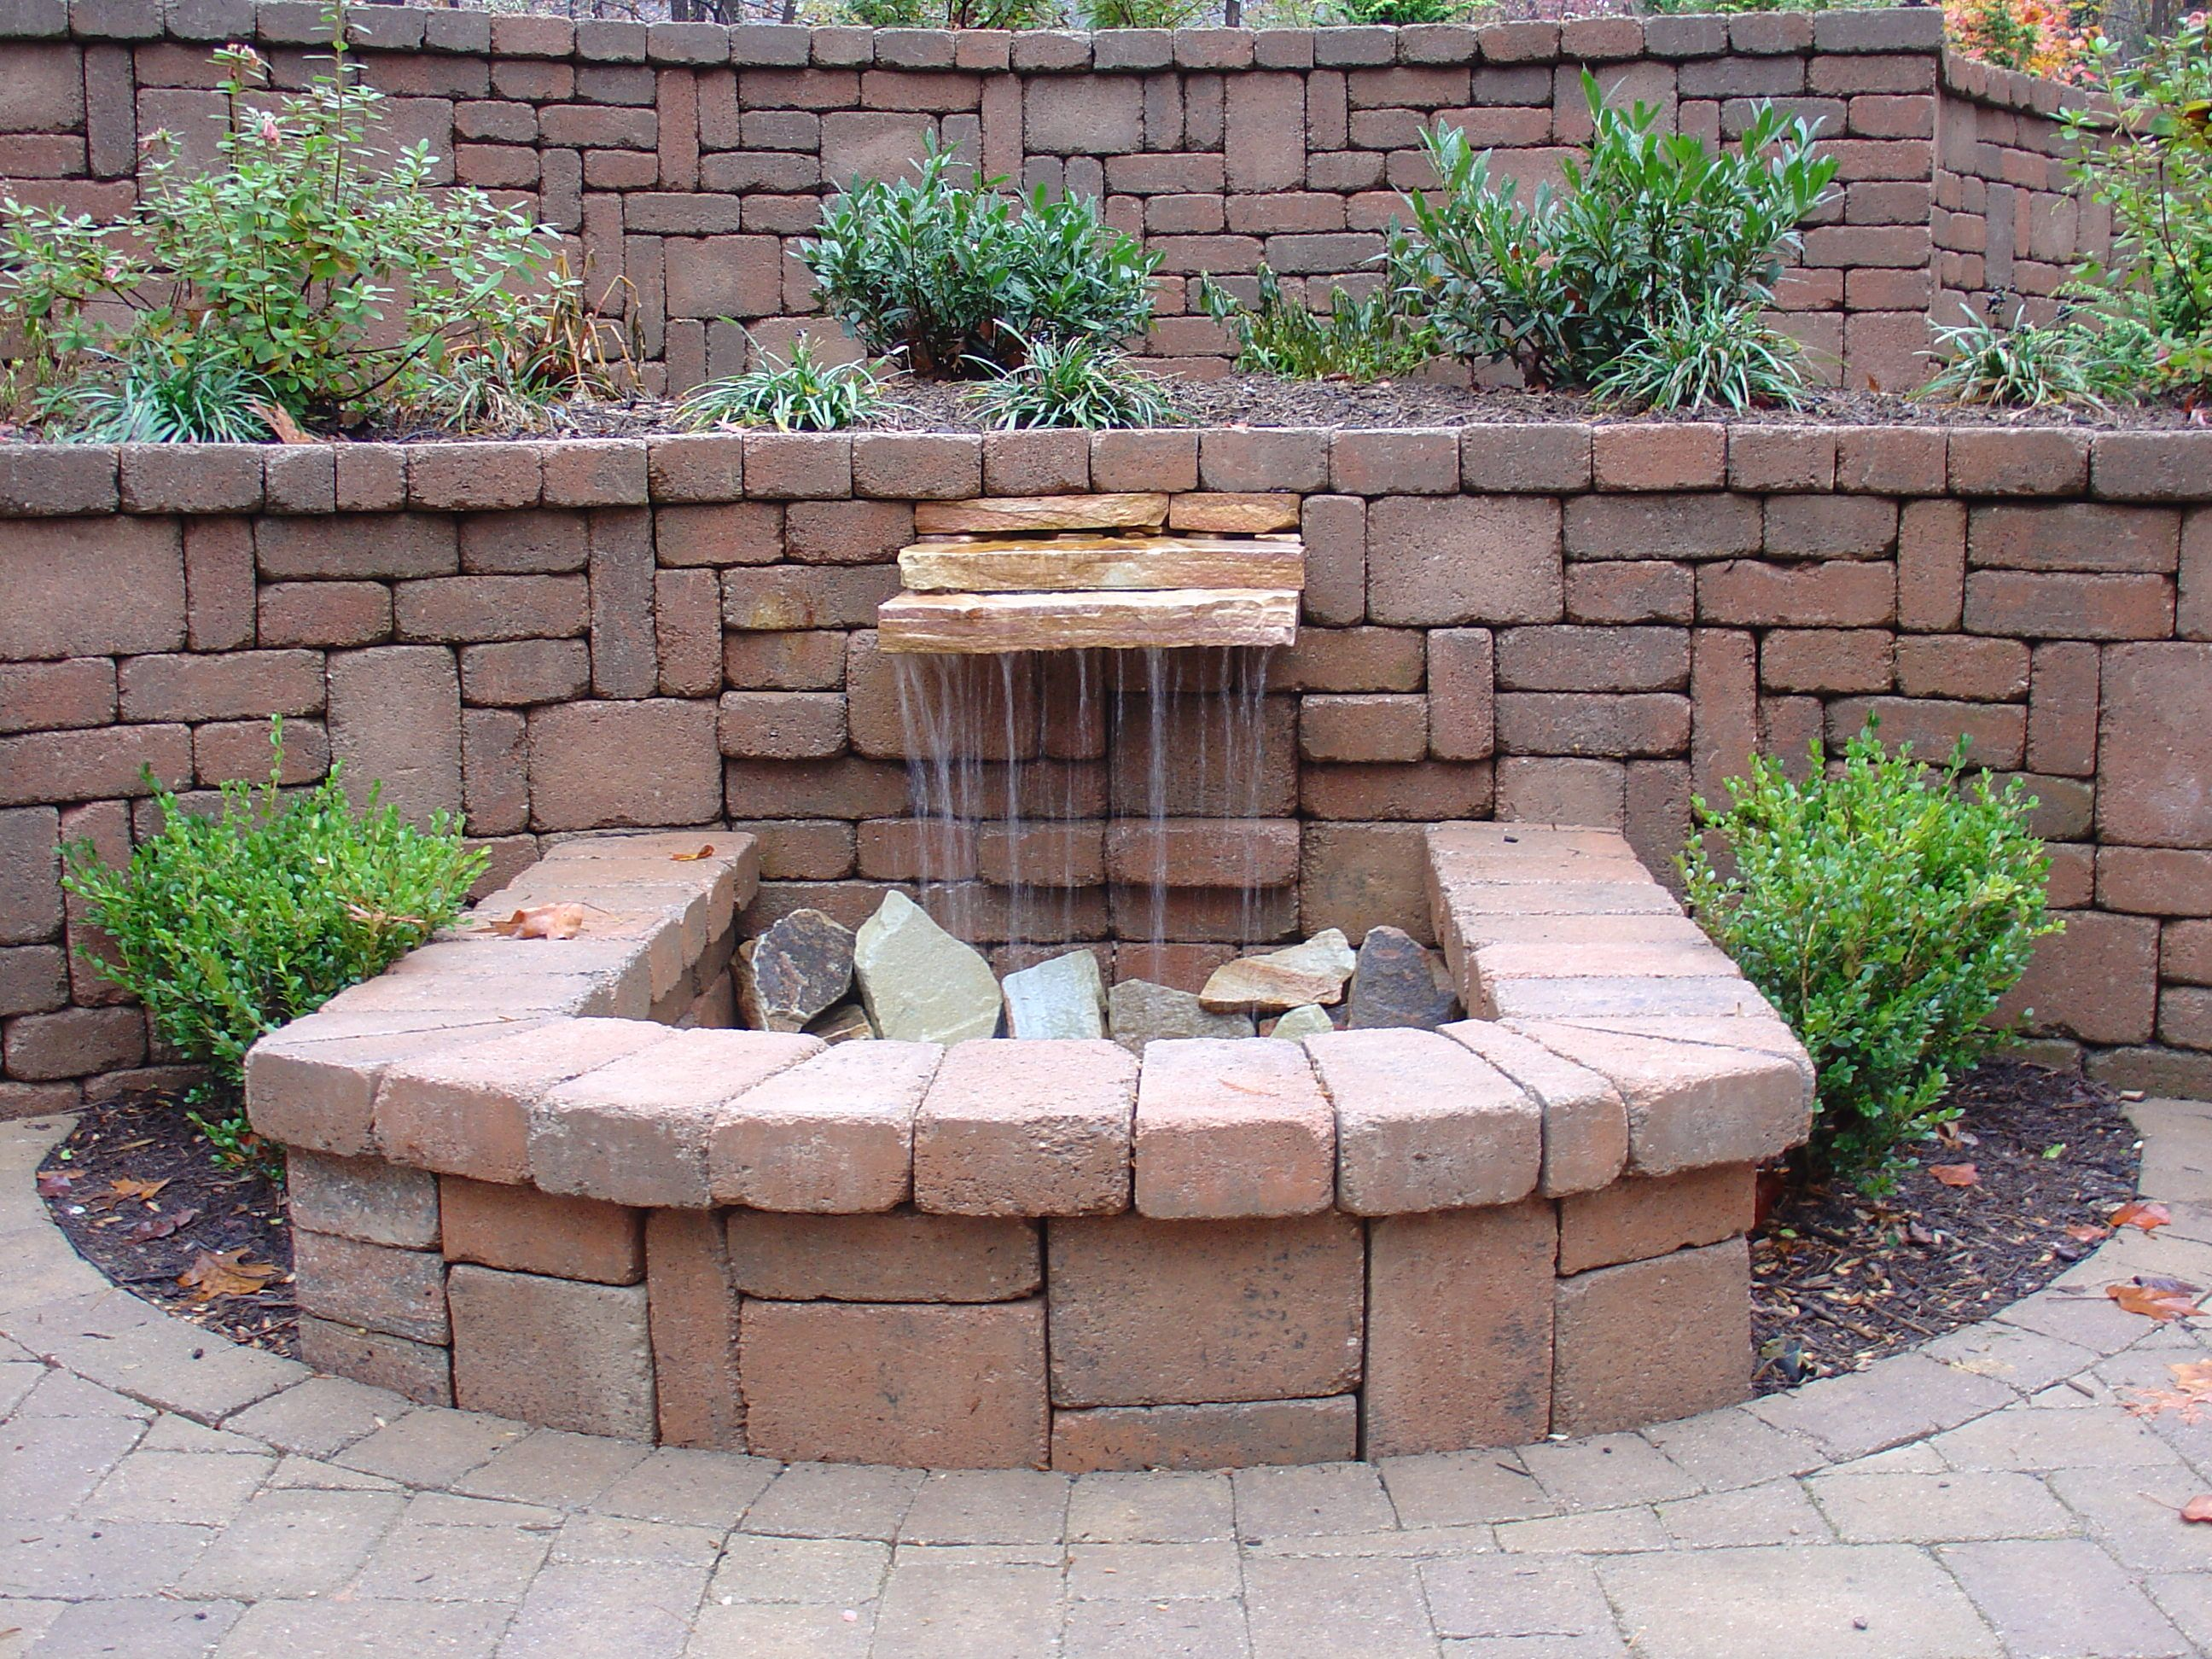 Pondless Waterfall With Brick Pavers Water Features Pinterest Brick Pavers Water Features